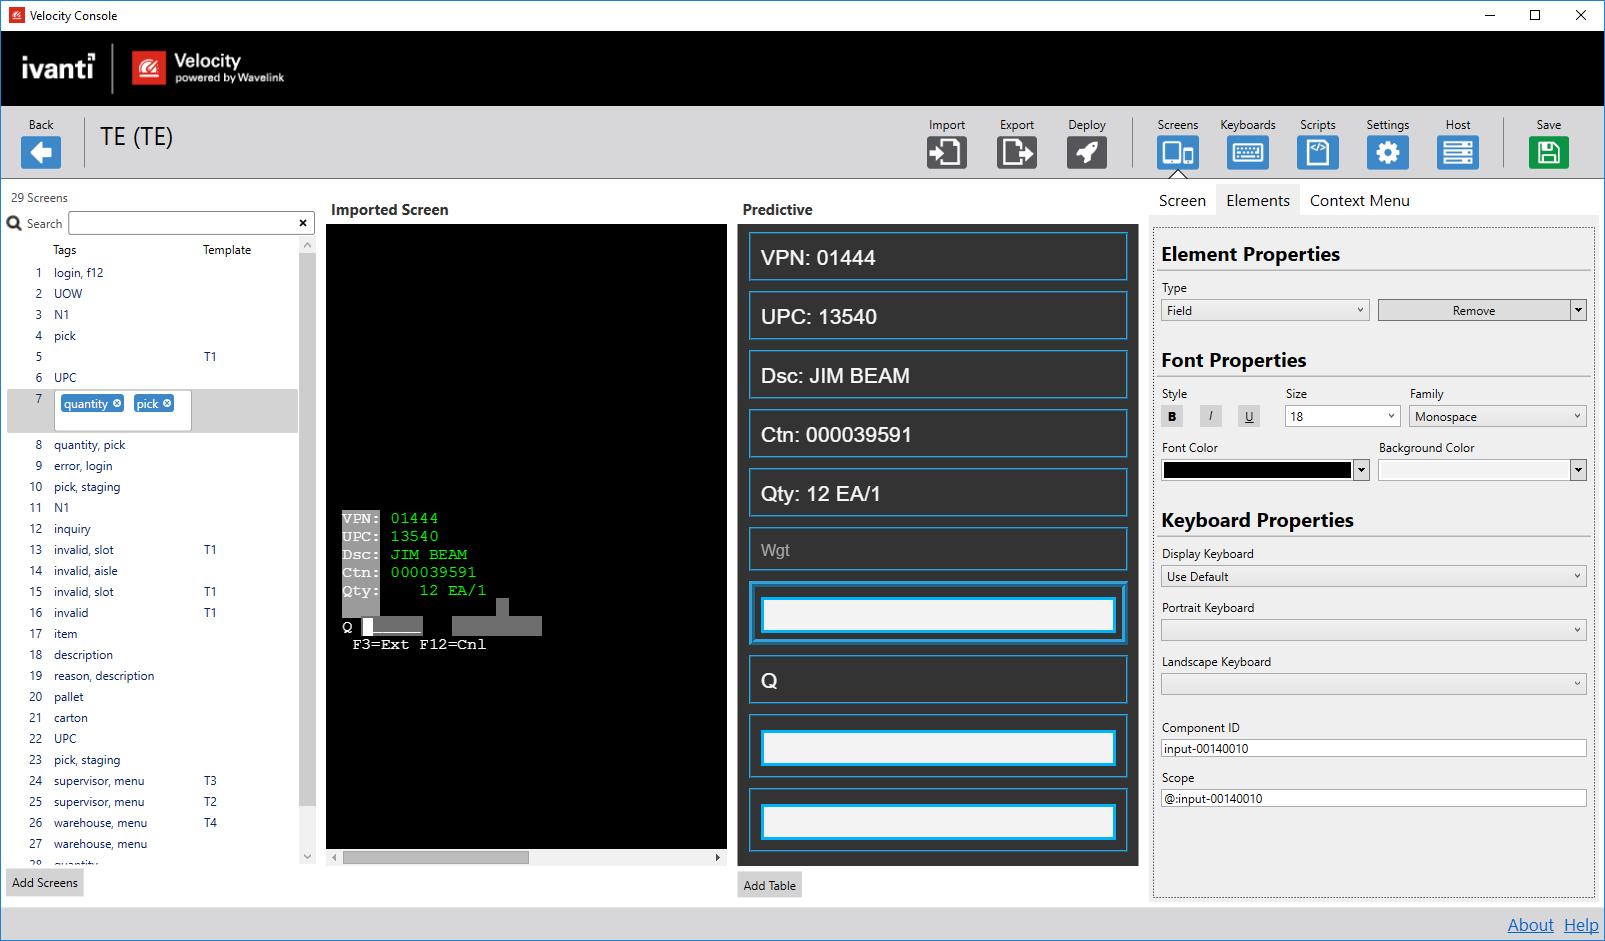 Velocity   Editing Screen Elements